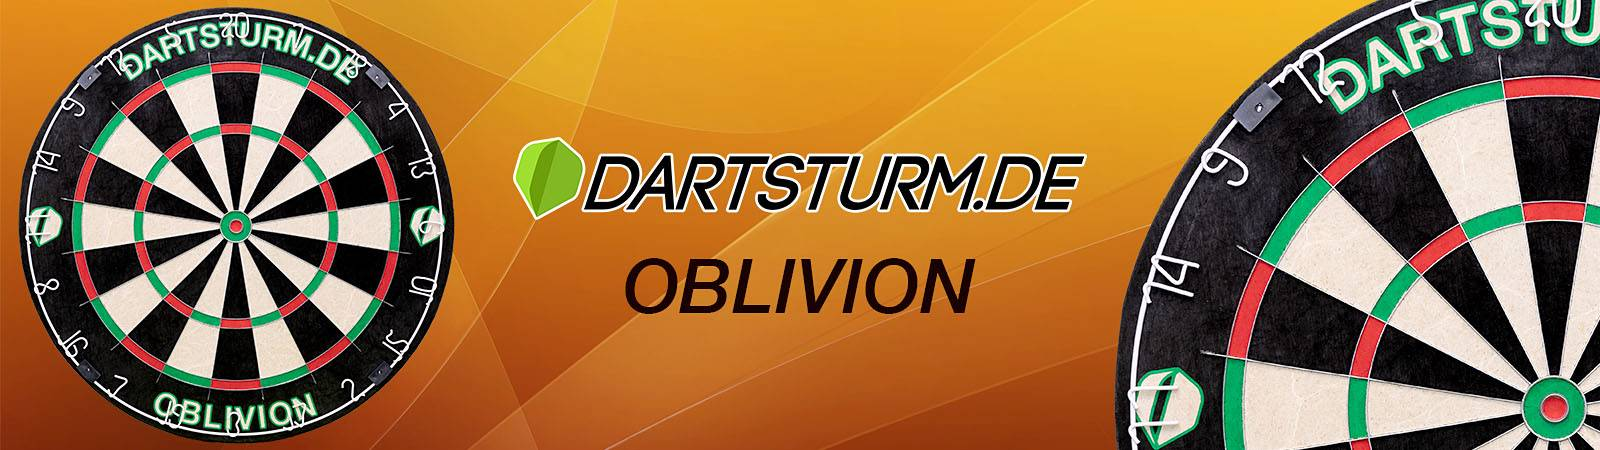 DartSturm-de-Oblivion-Kategorie-Banner